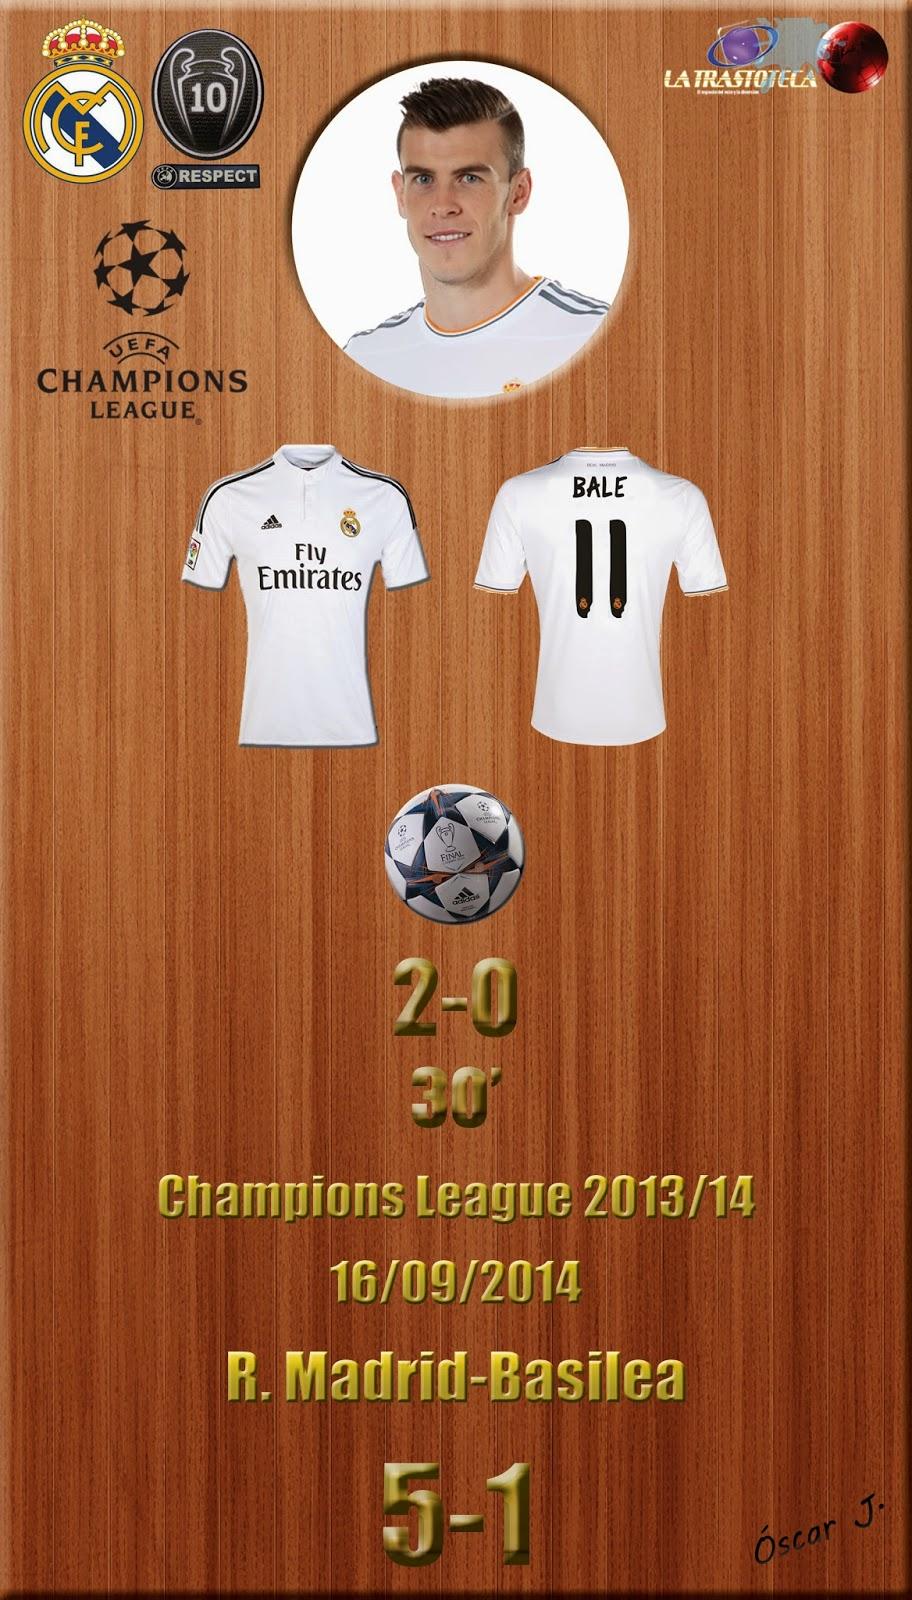 Bale (2-0) (Golazo de la jornada) - Champions League. Jornada 1 (16/09/2014)